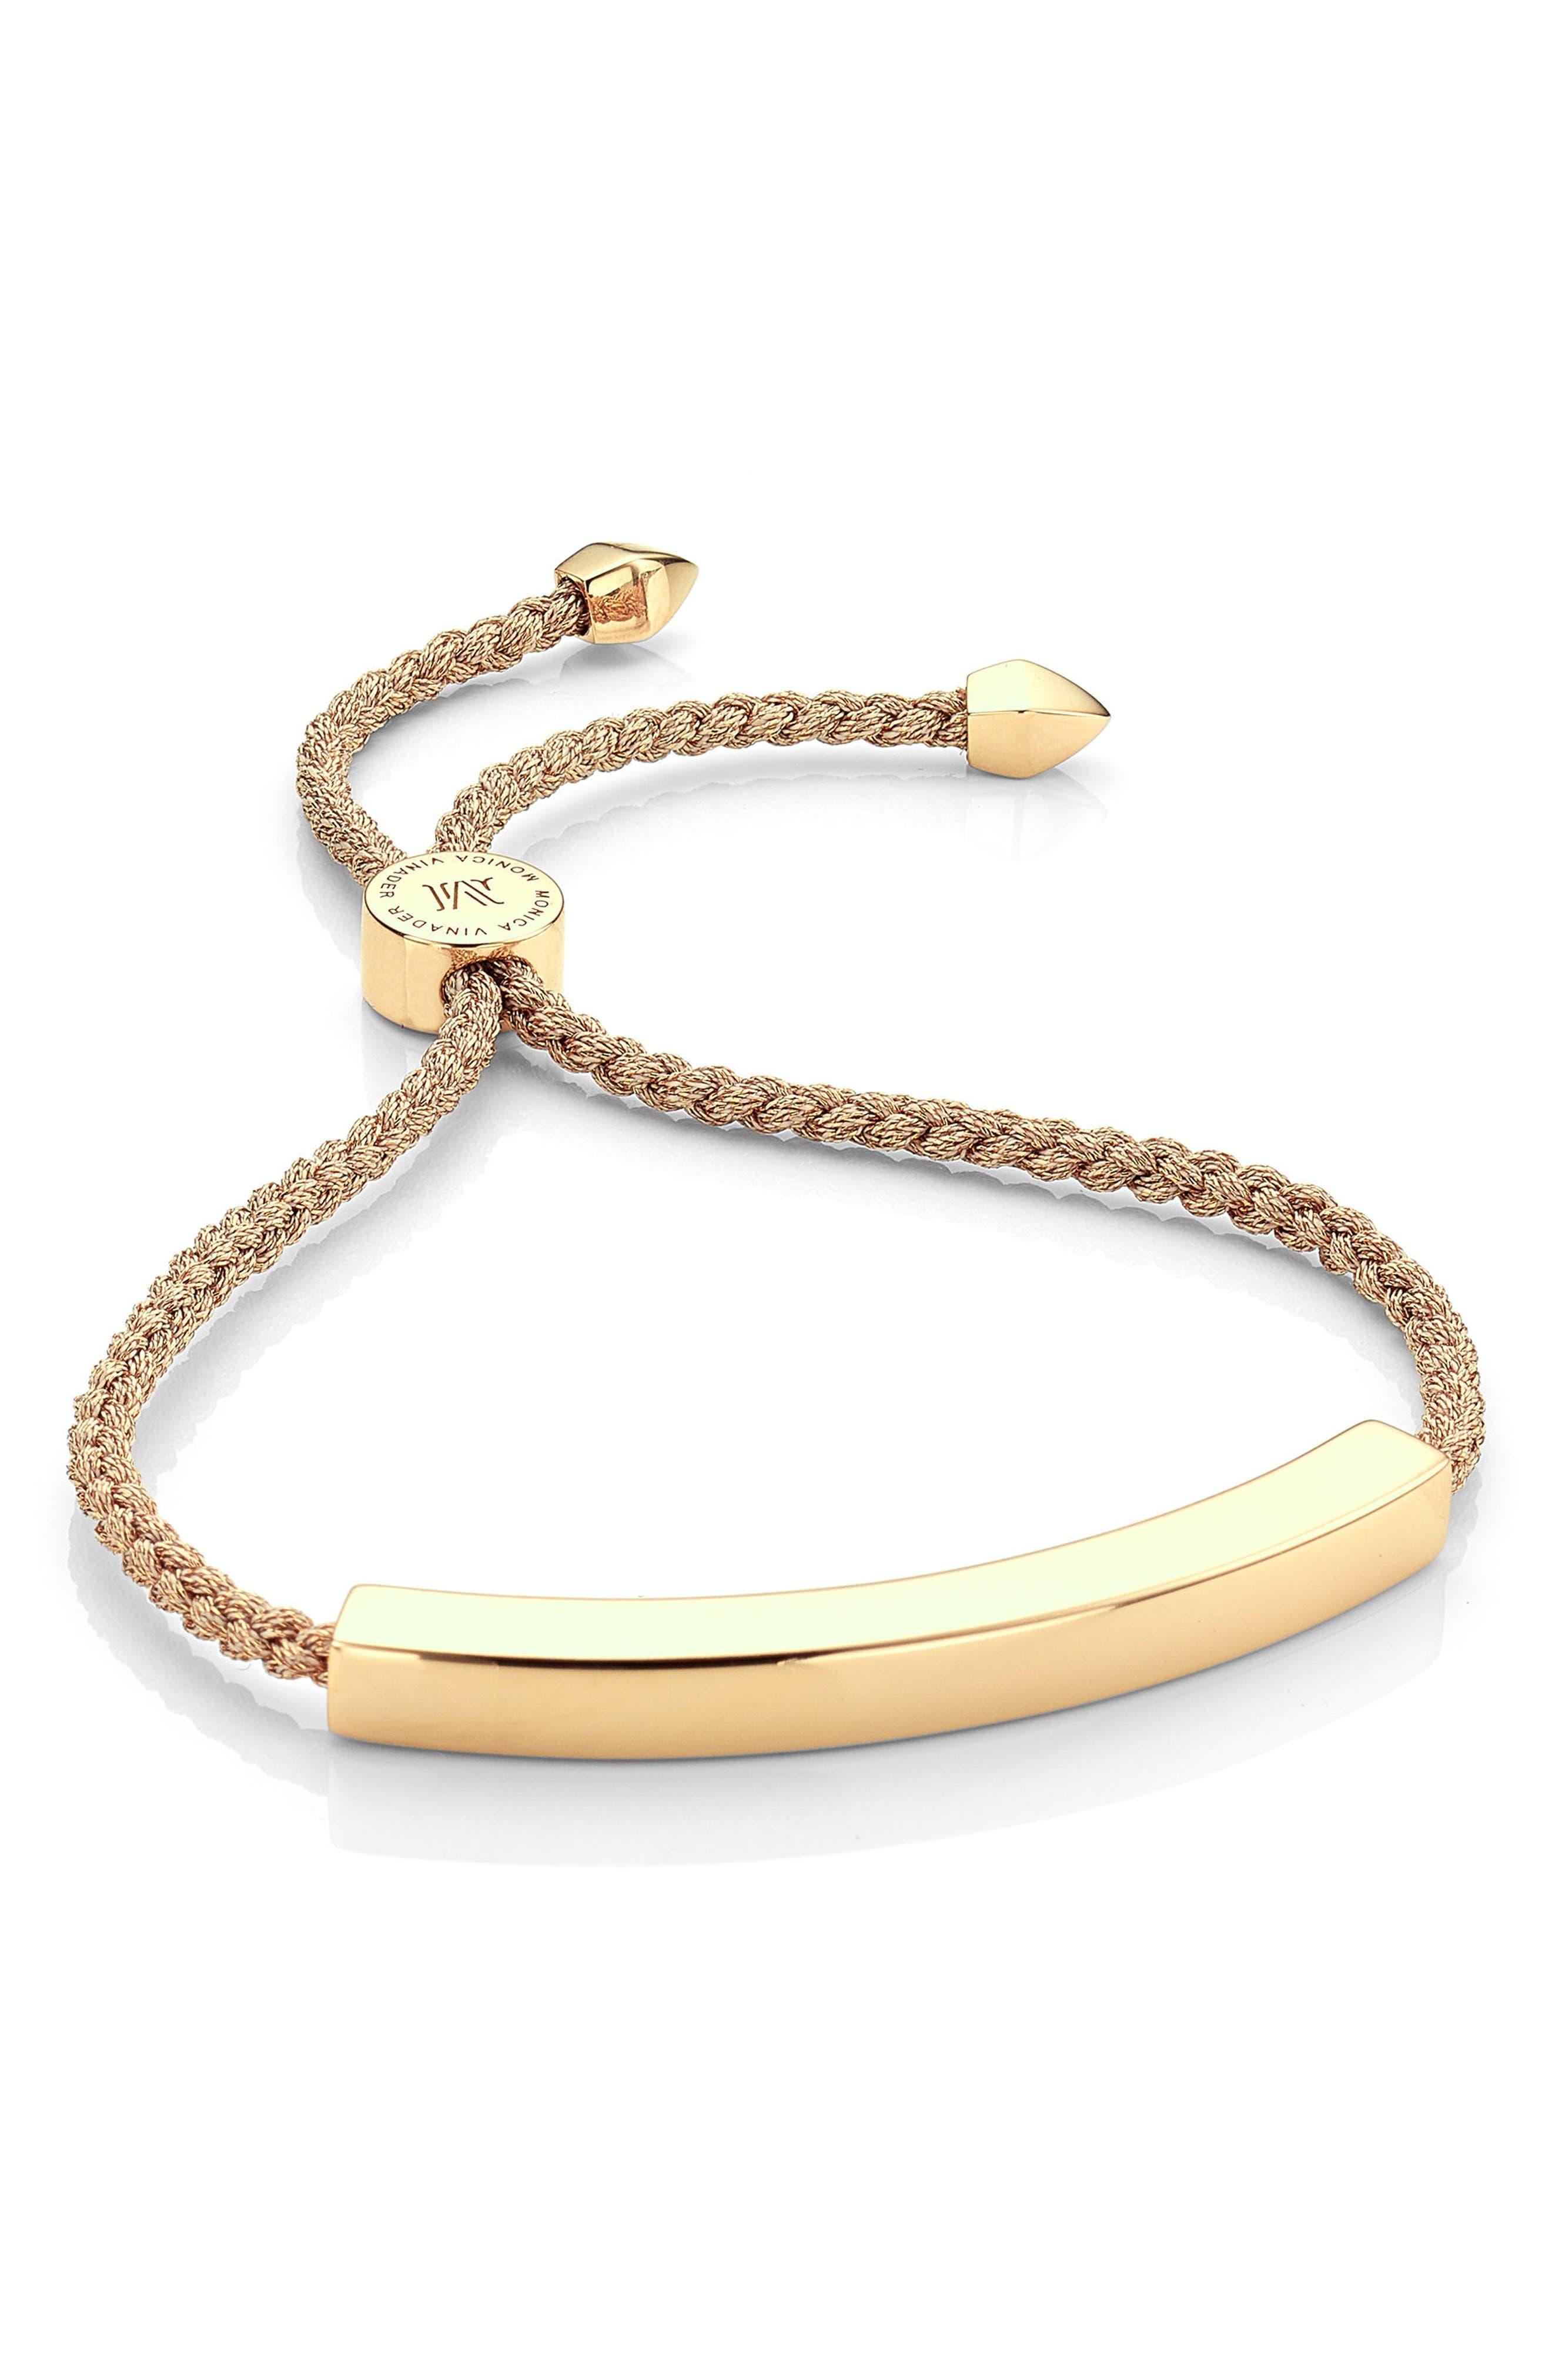 Linear Friendship Bracelet,                         Main,                         color, Metallic/ Yellow Gold